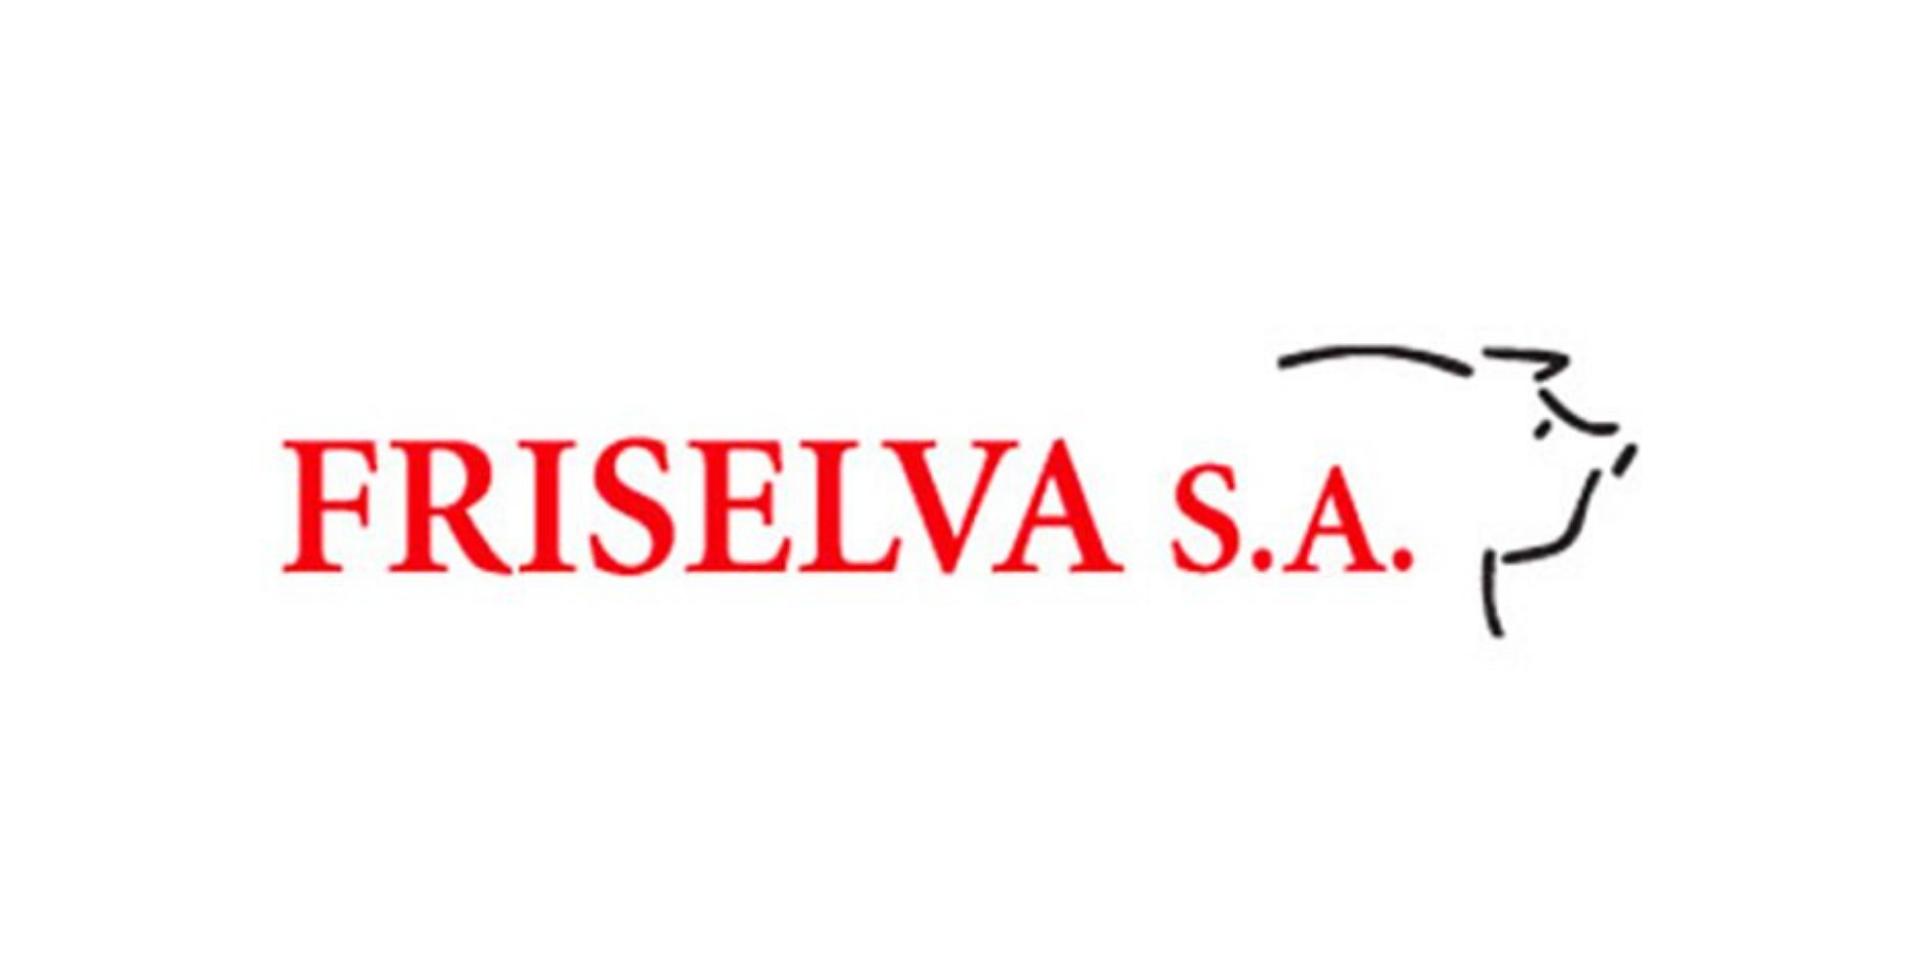 Friselva